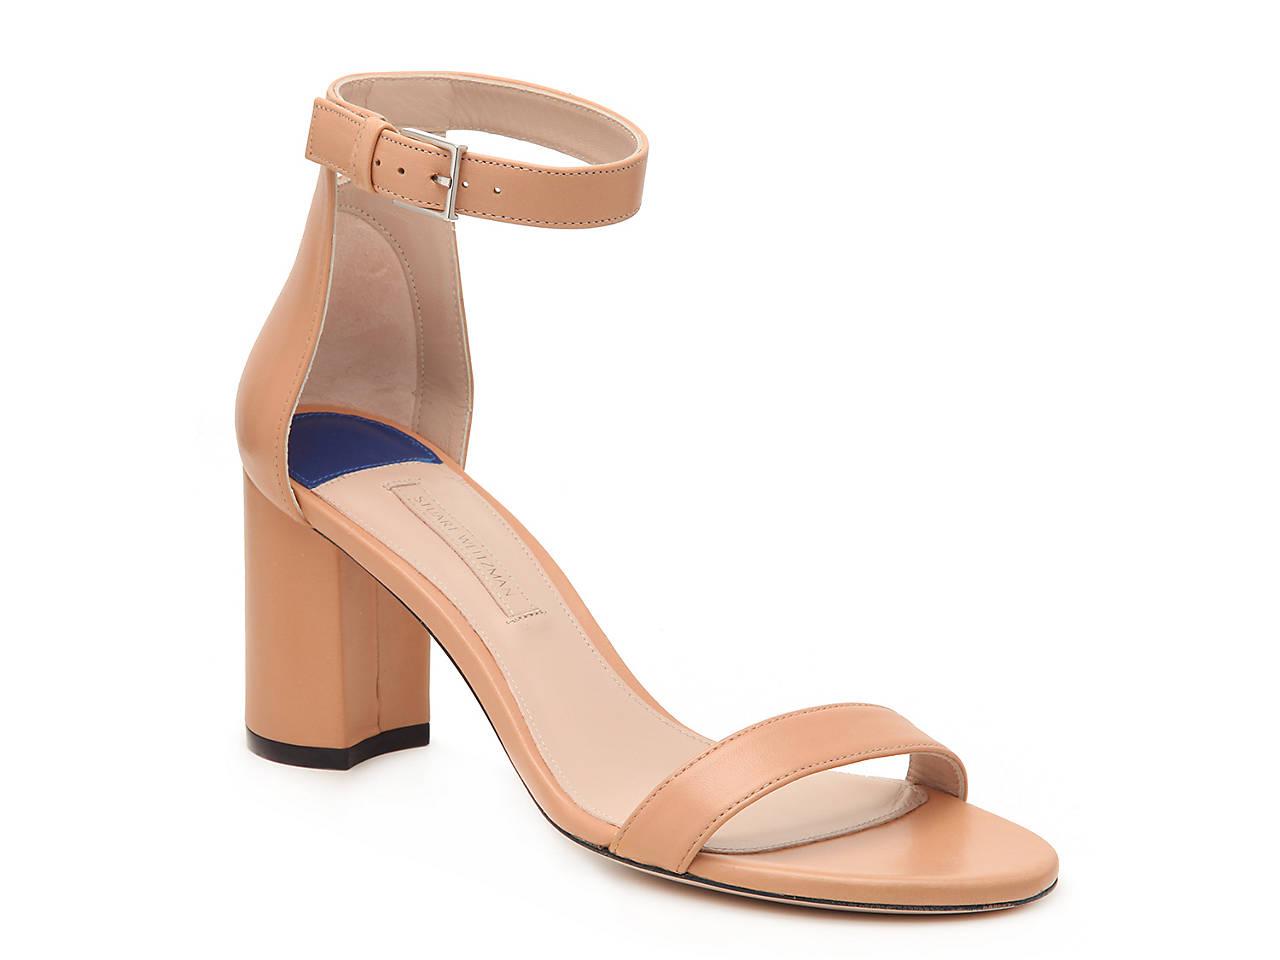 92e148692281 Stuart Weitzman Lessnu Sandal Women s Shoes